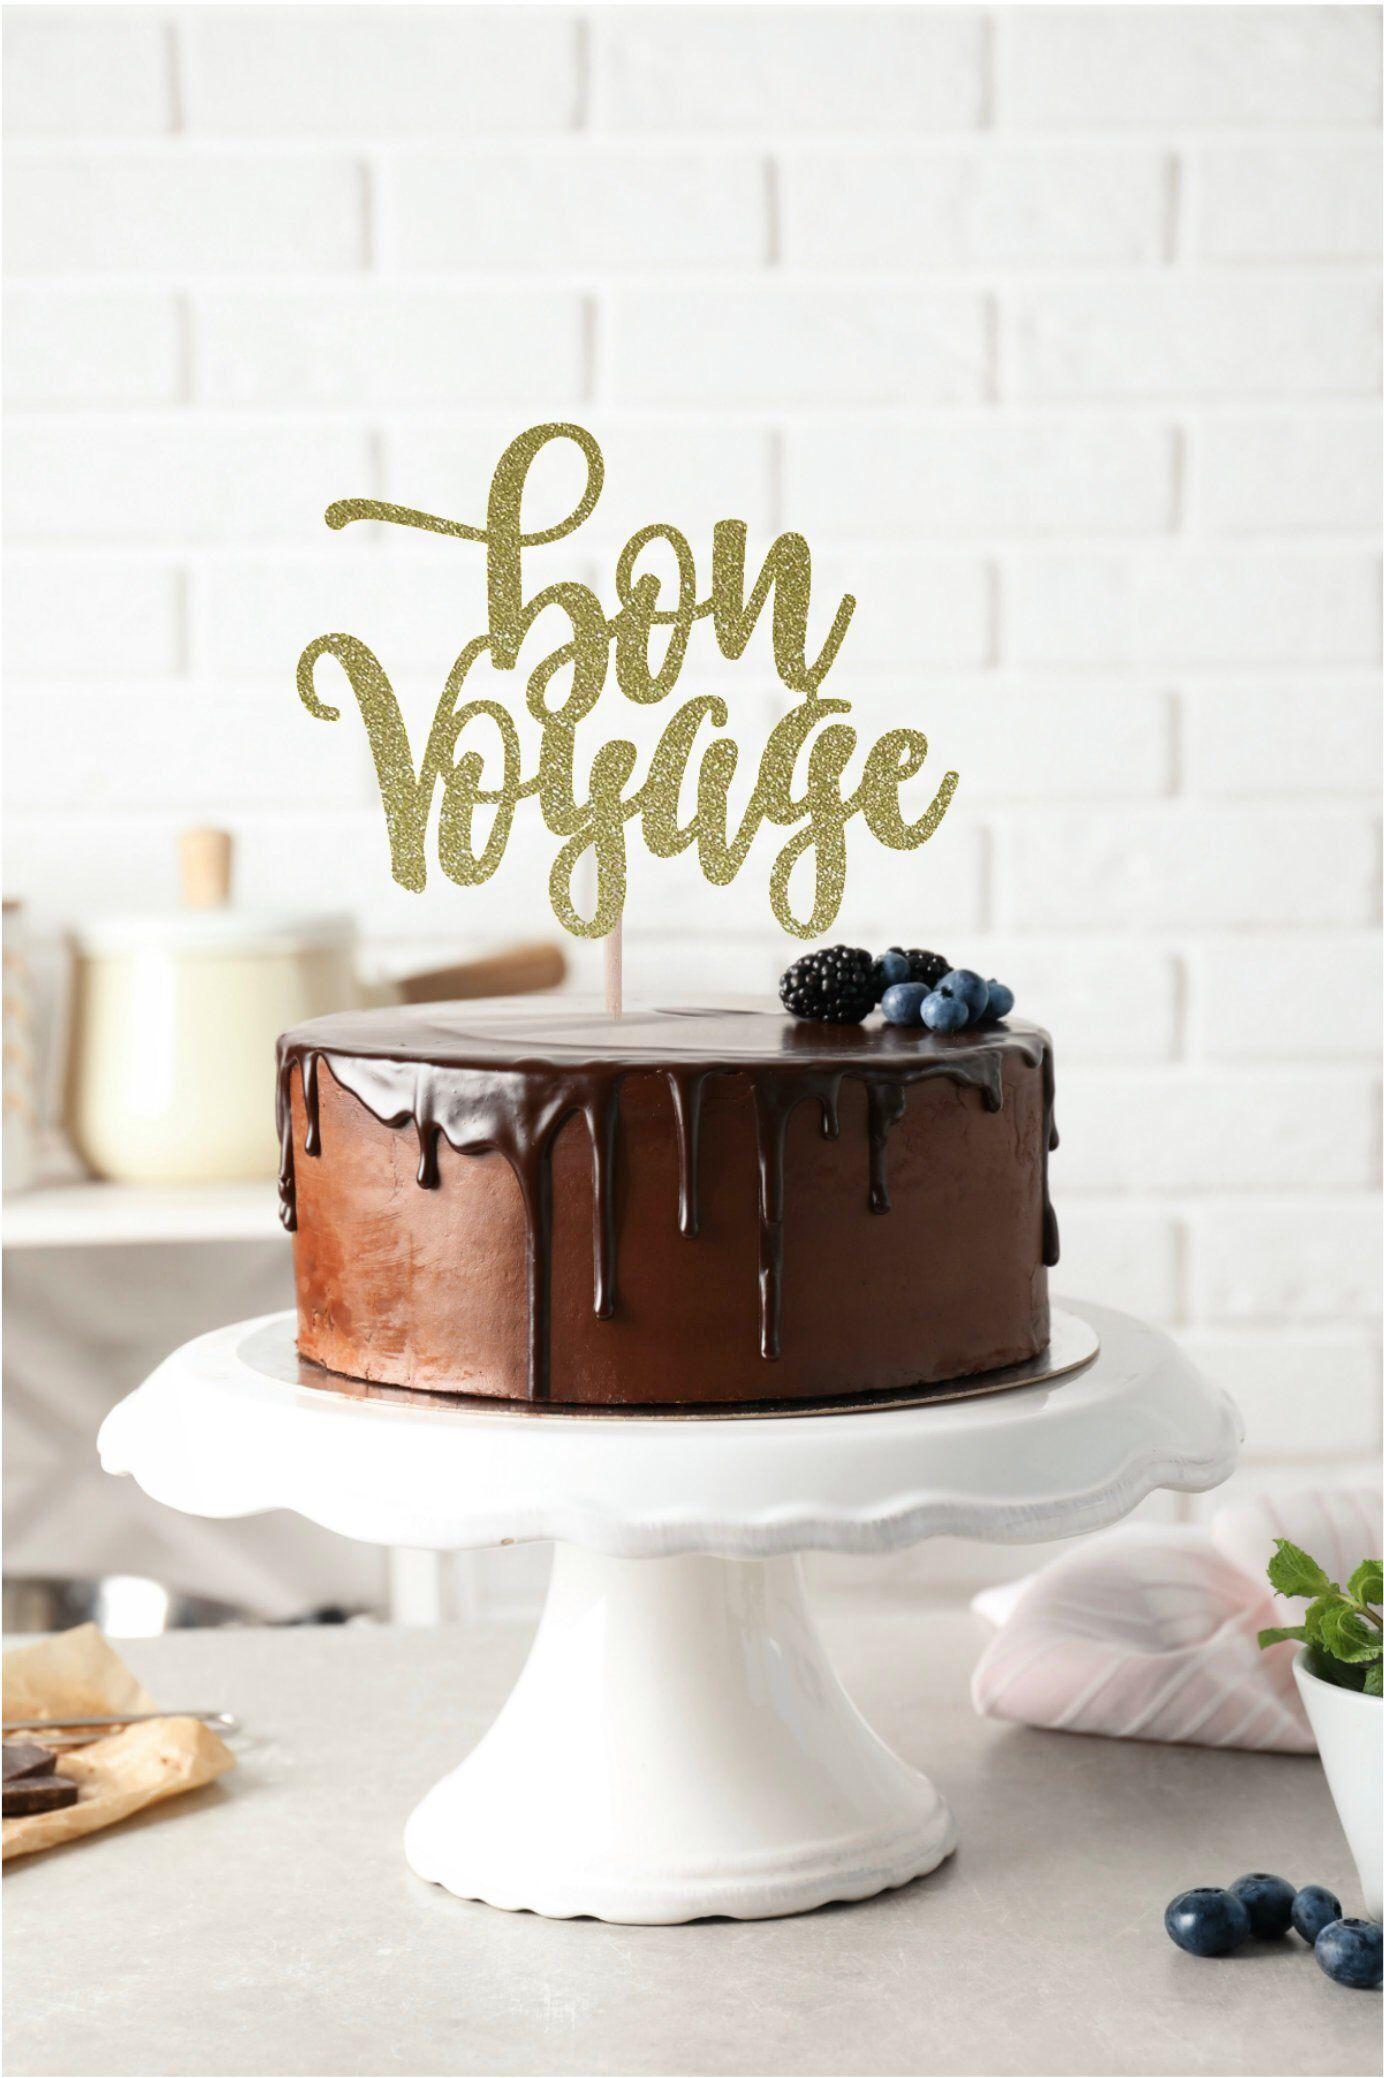 Bon Voyage Cake Topper Going Away Party Cake Topper Retirement